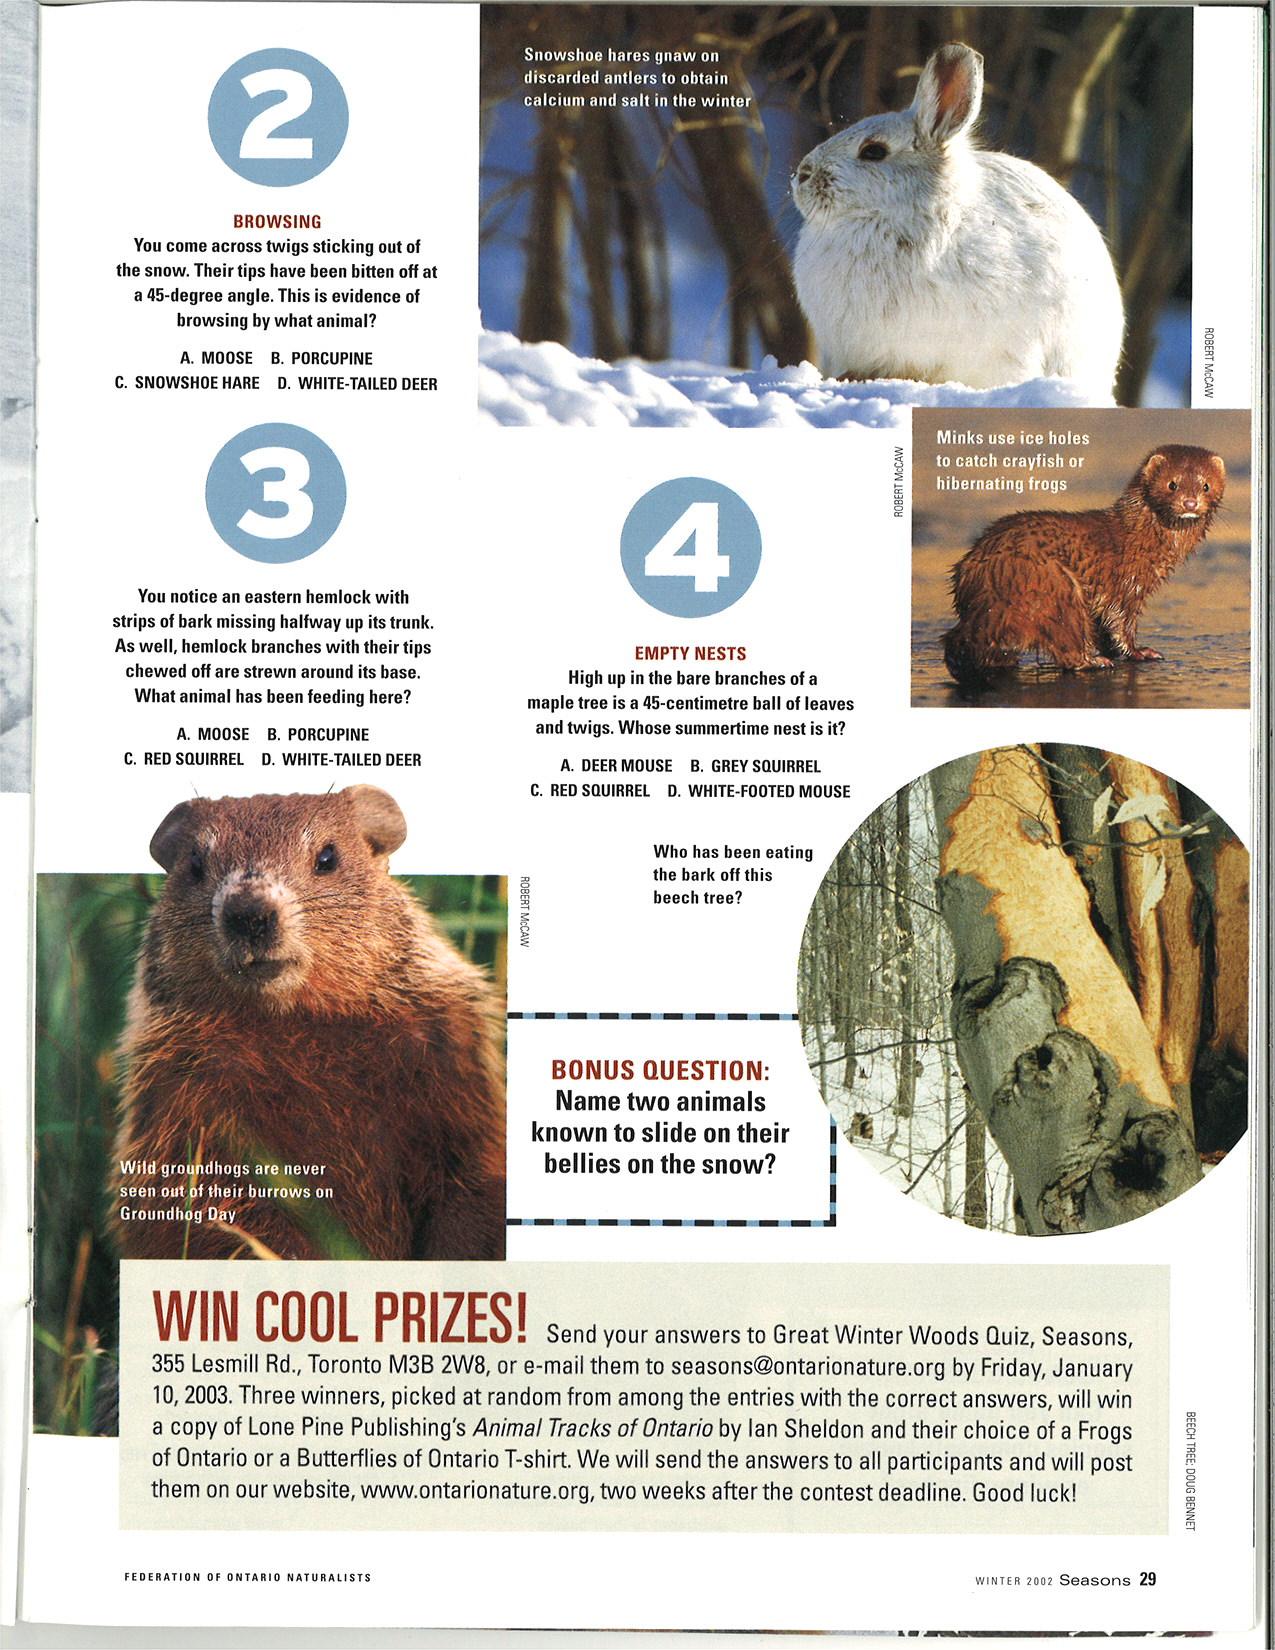 seasons_2002_v42_i4_f_The_great_winter_woods_quiz_29